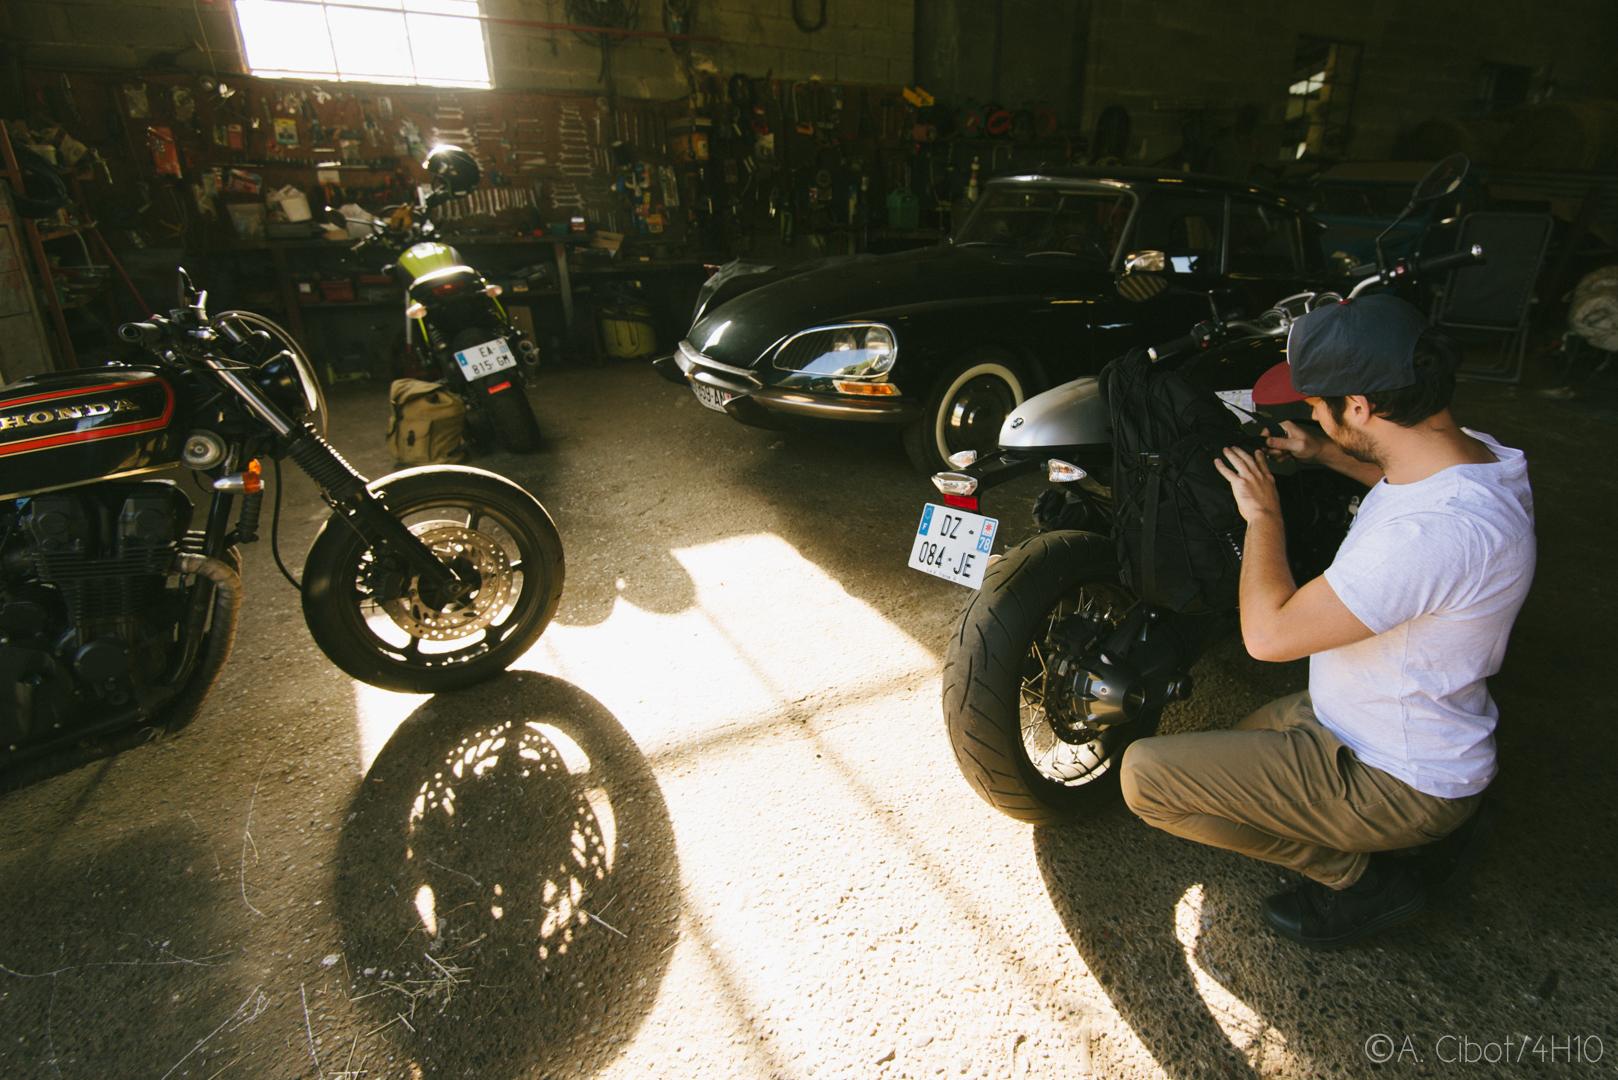 roadtrip-moto-auvergne-saint-flour-cantal-ballade-itineraire-4h10-ninety-scrambler10